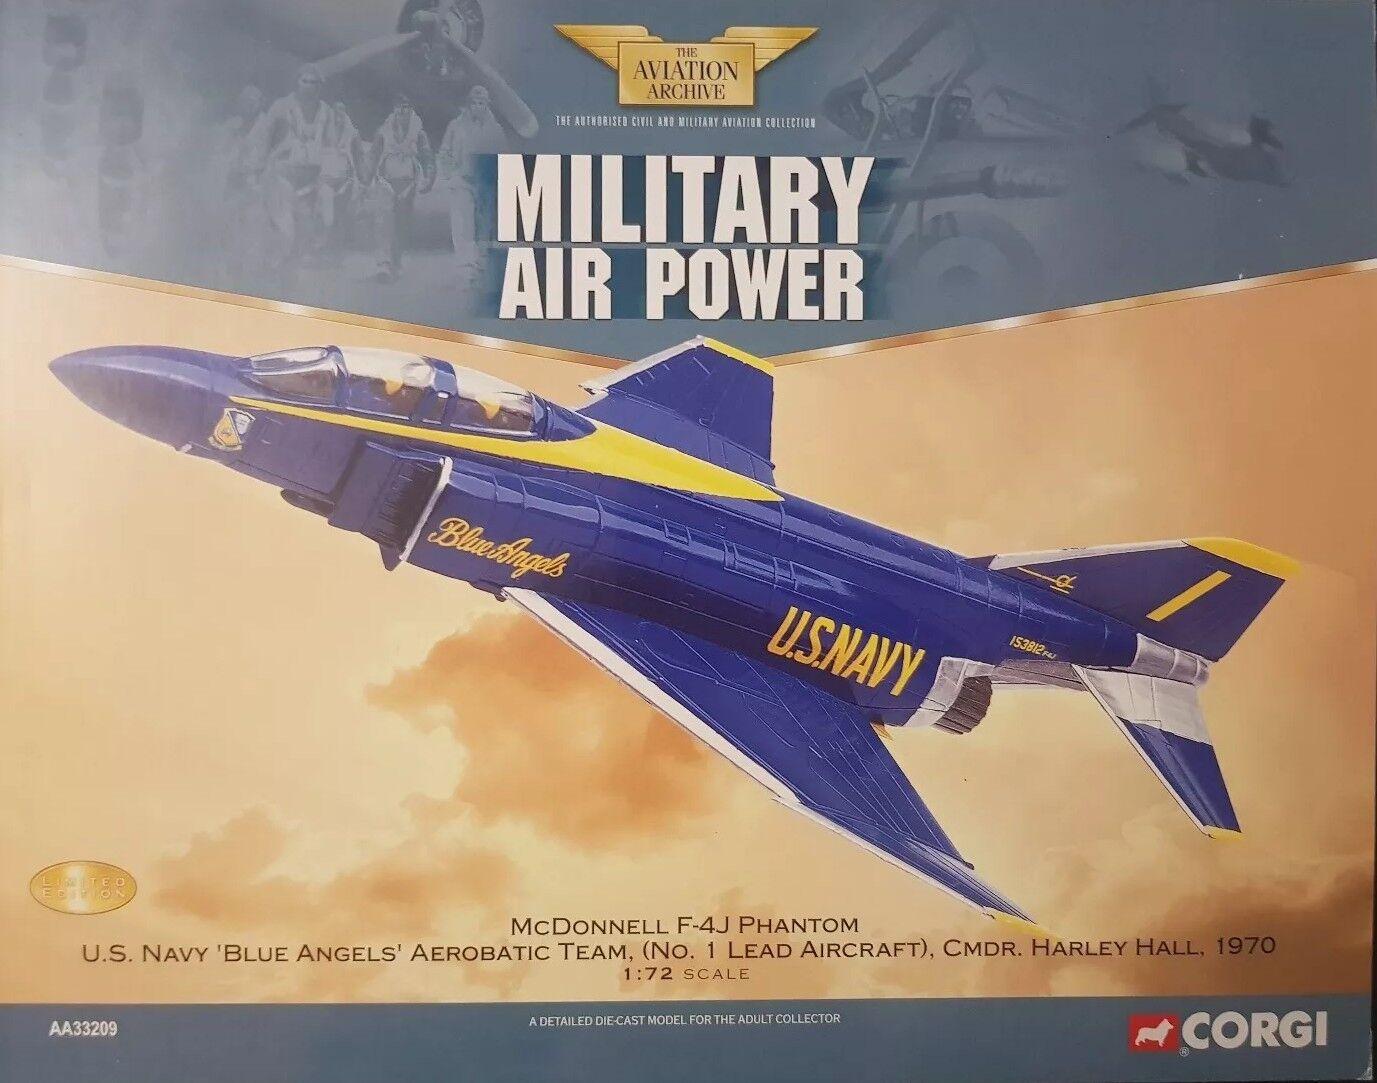 Corgi Aviation McDonnell F-4J Phantom US Navy  bleu Angels'S 1970 AA33209